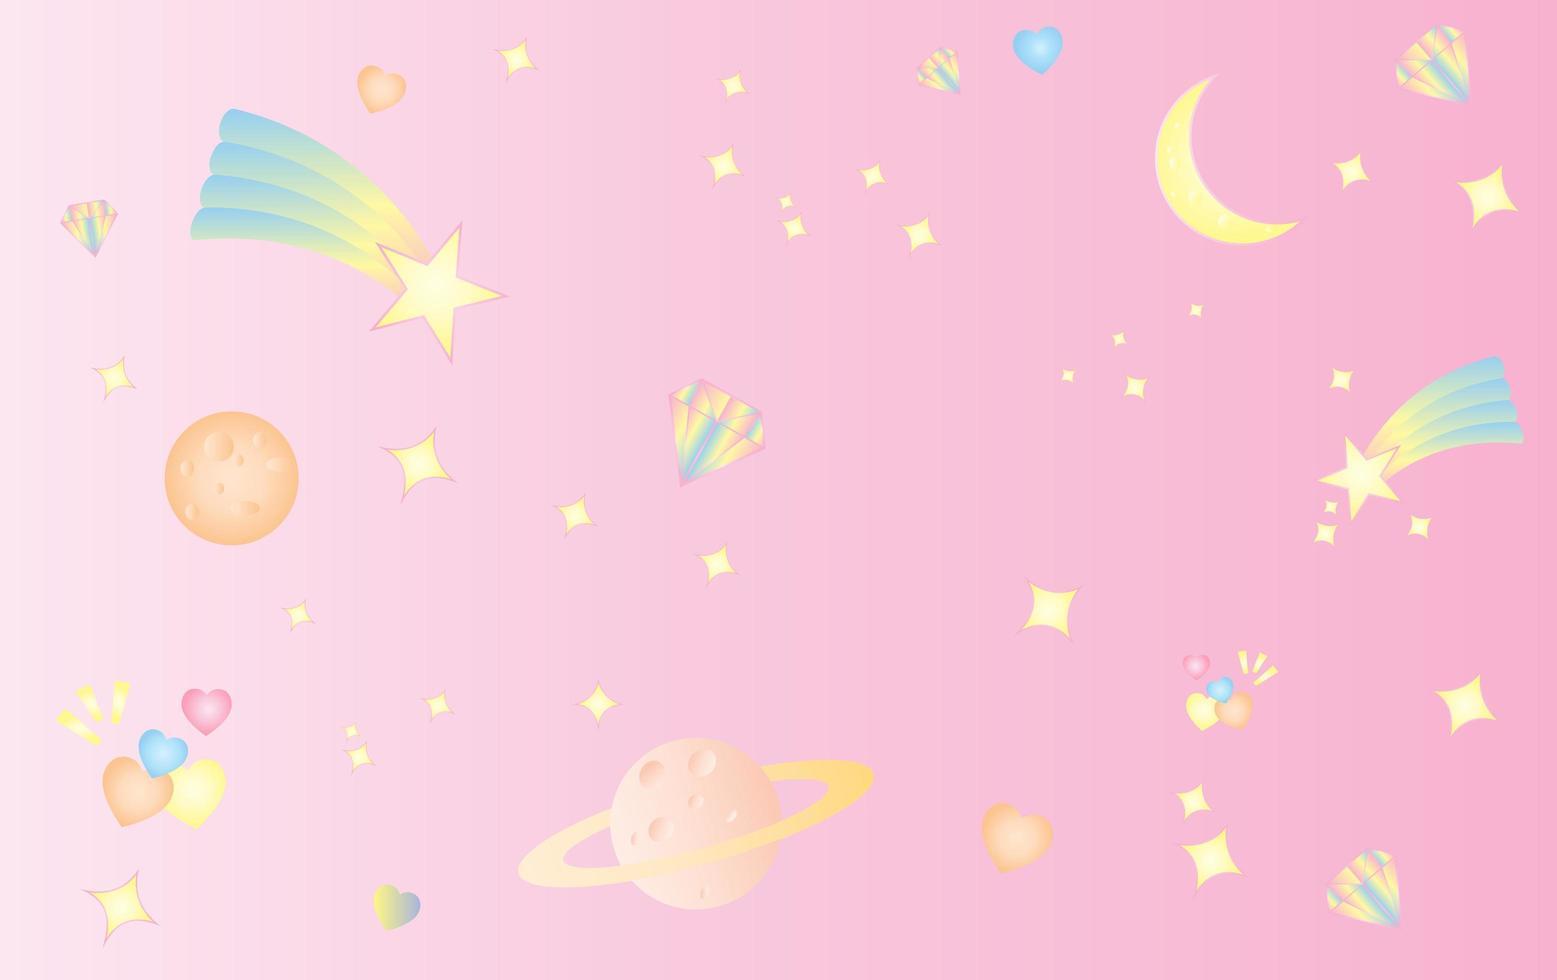 ruimte en kosmos zoete schattige pastel roze achtergrond vector